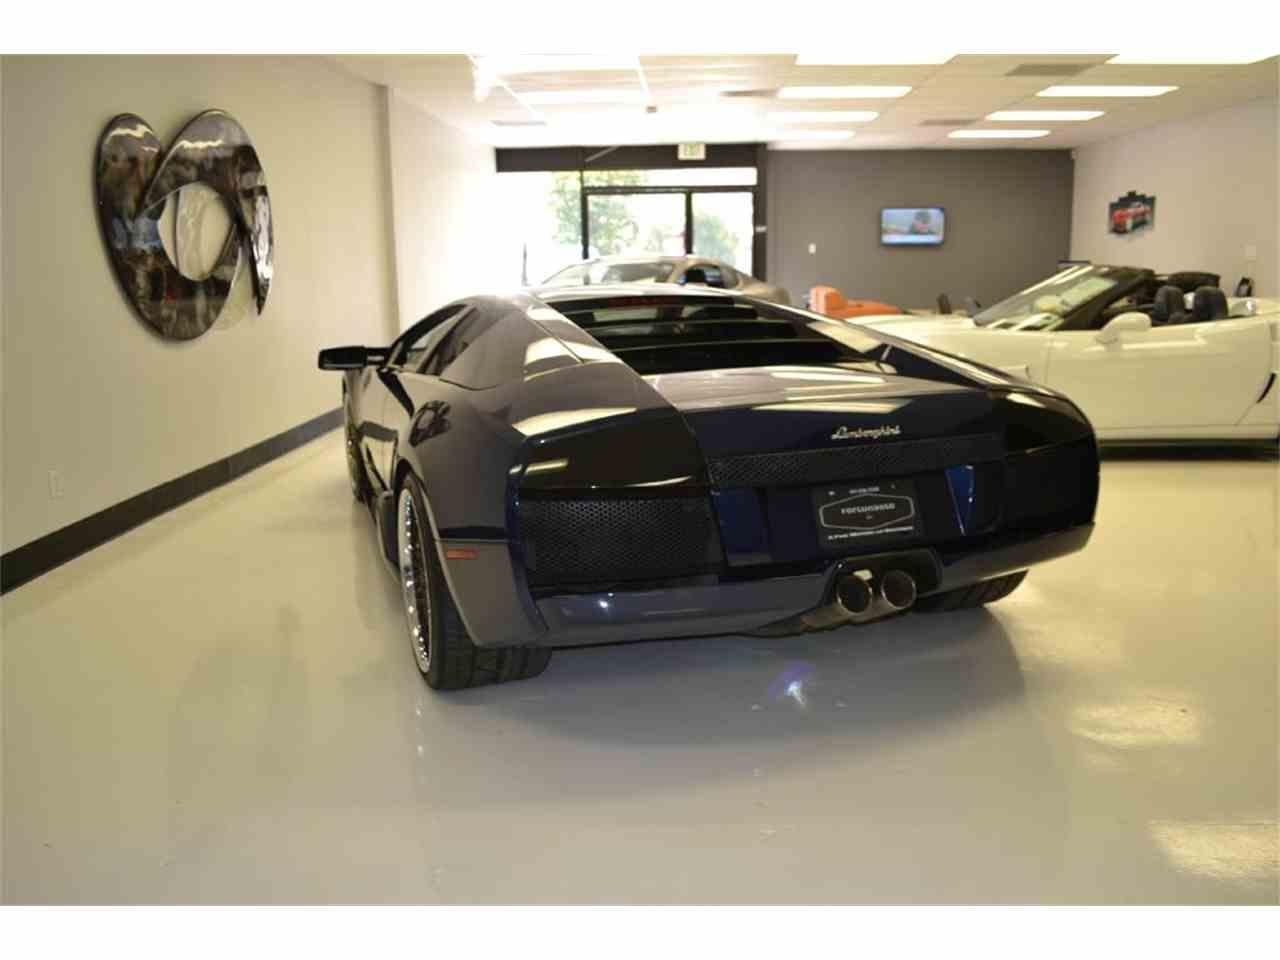 Large Picture of 2004 Lamborghini Murcielago located in California Offered by Fortunauto 13 LLC - LVJ1